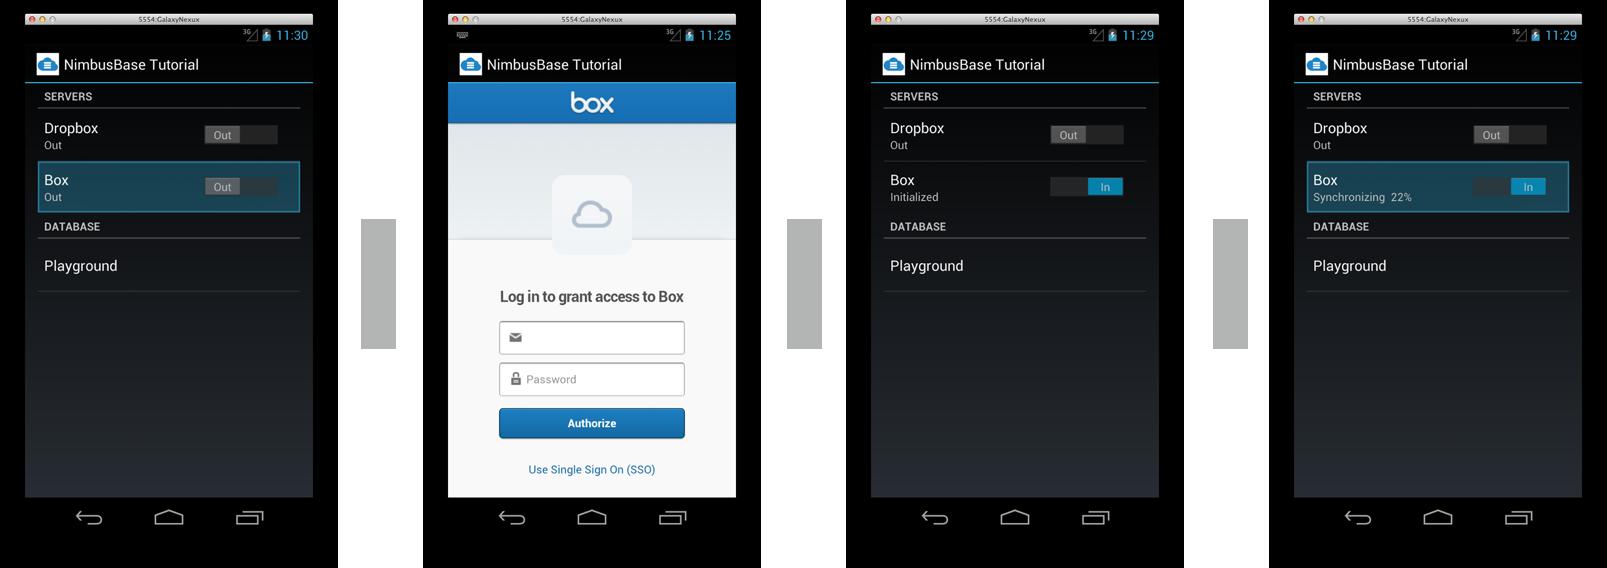 GitHub - NimbusBase/NimbusBase_Android_Tutorial: Syncing your sqlite